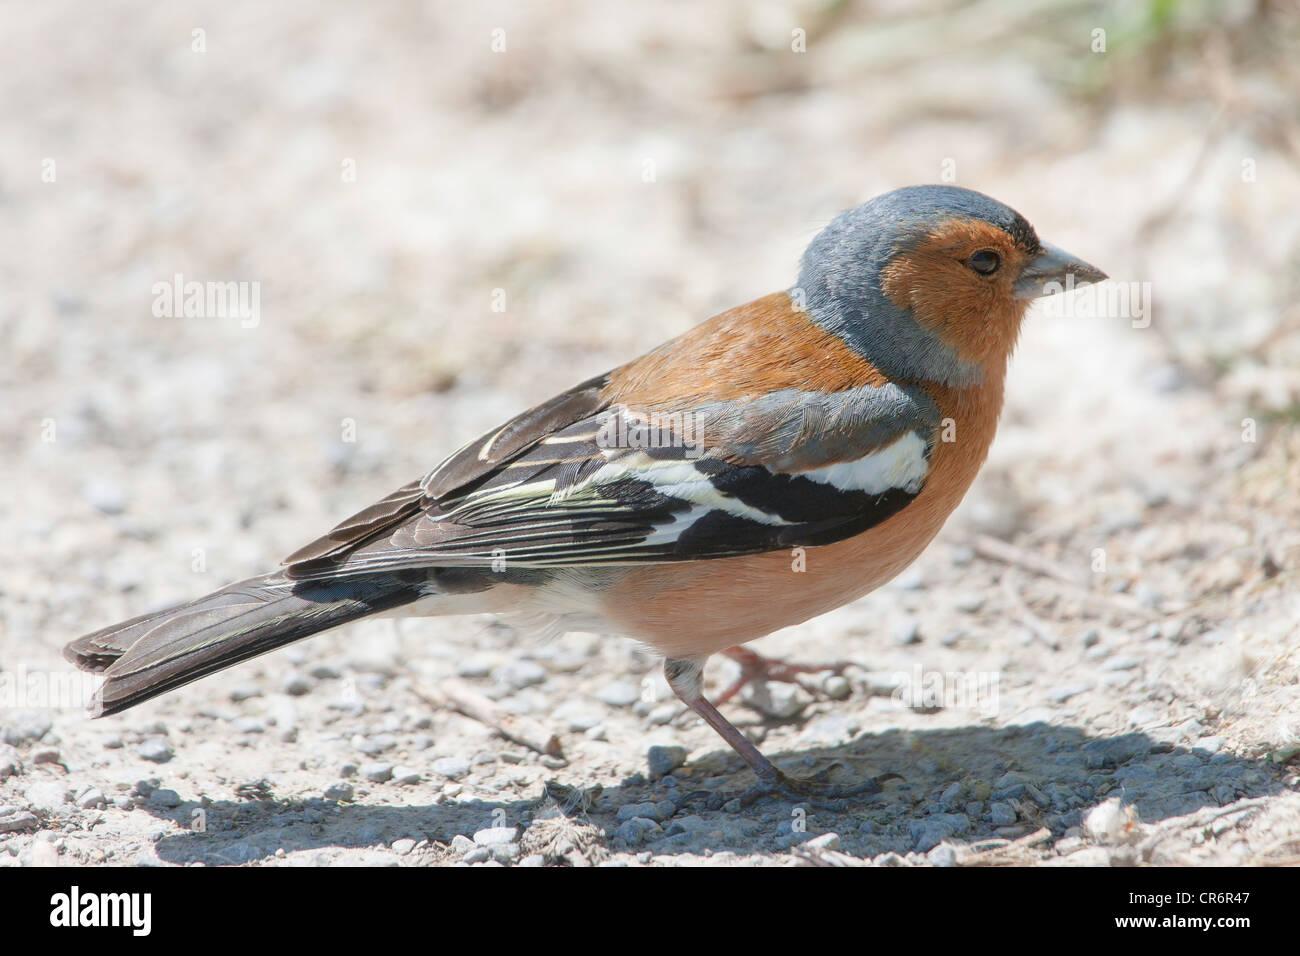 Male chaffinch (Fringilla coelebs) - Stock Image